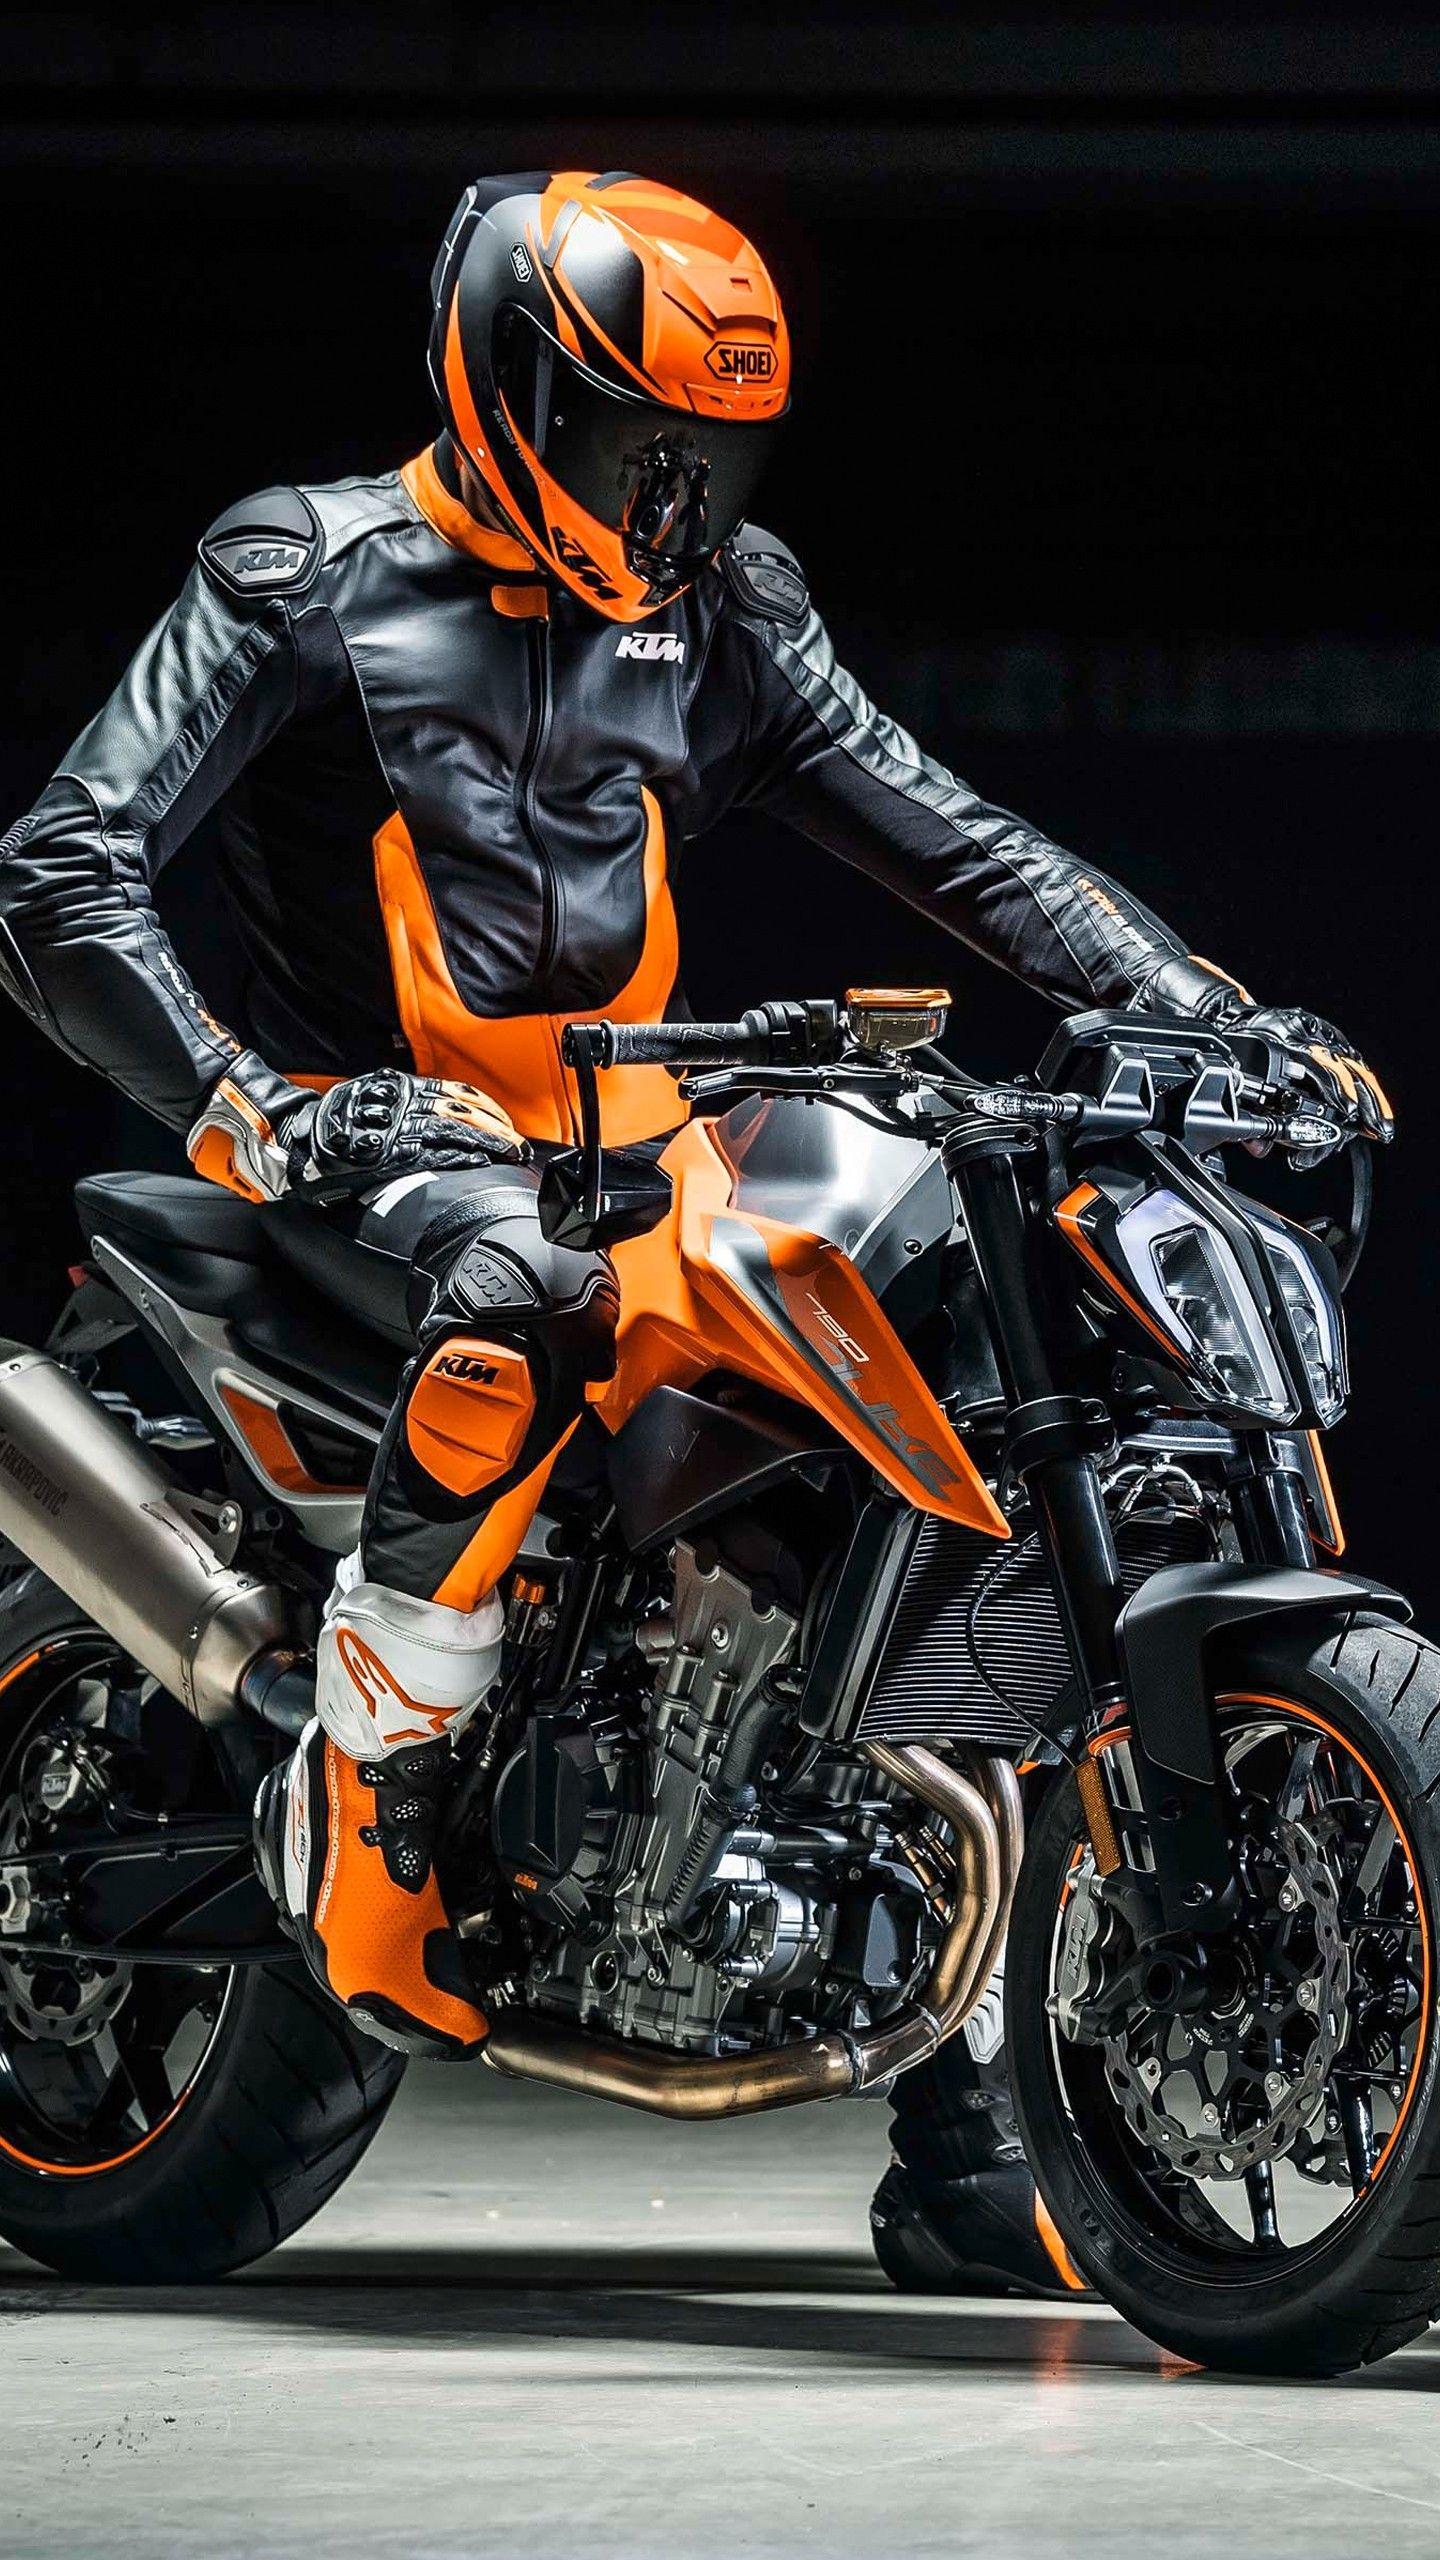 2018 Husqvarna Vitpilen 701 Motorcycle 4k Wallpaper Motorcycle